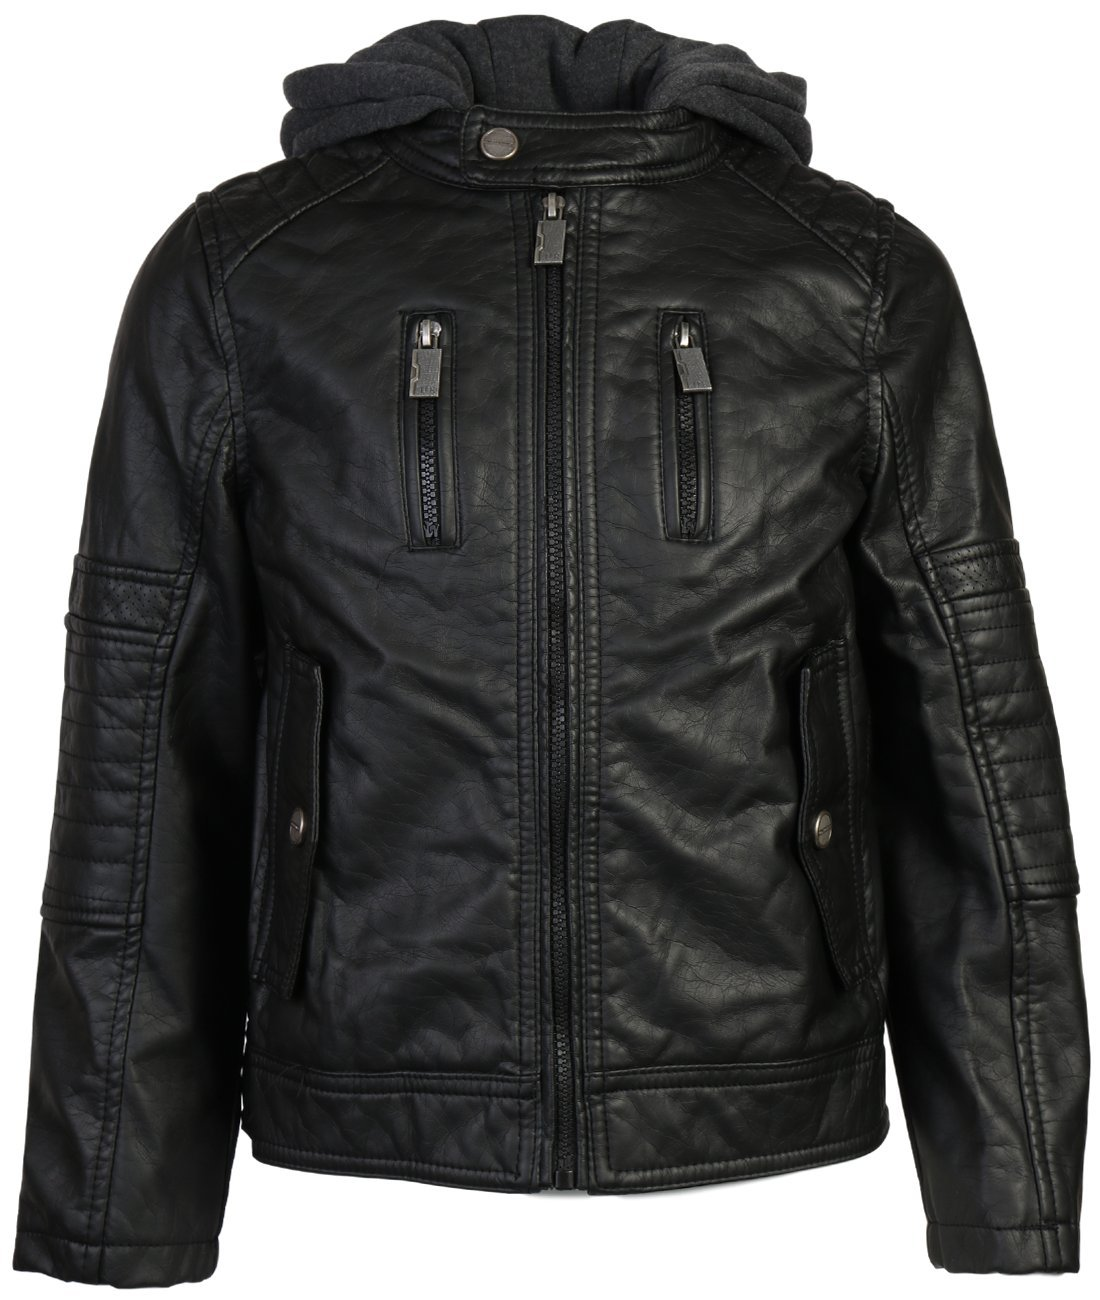 Urban Republic Boys Faux Leather Biker Hooded Jacket, Black w/Flap Pocket, 10/12'